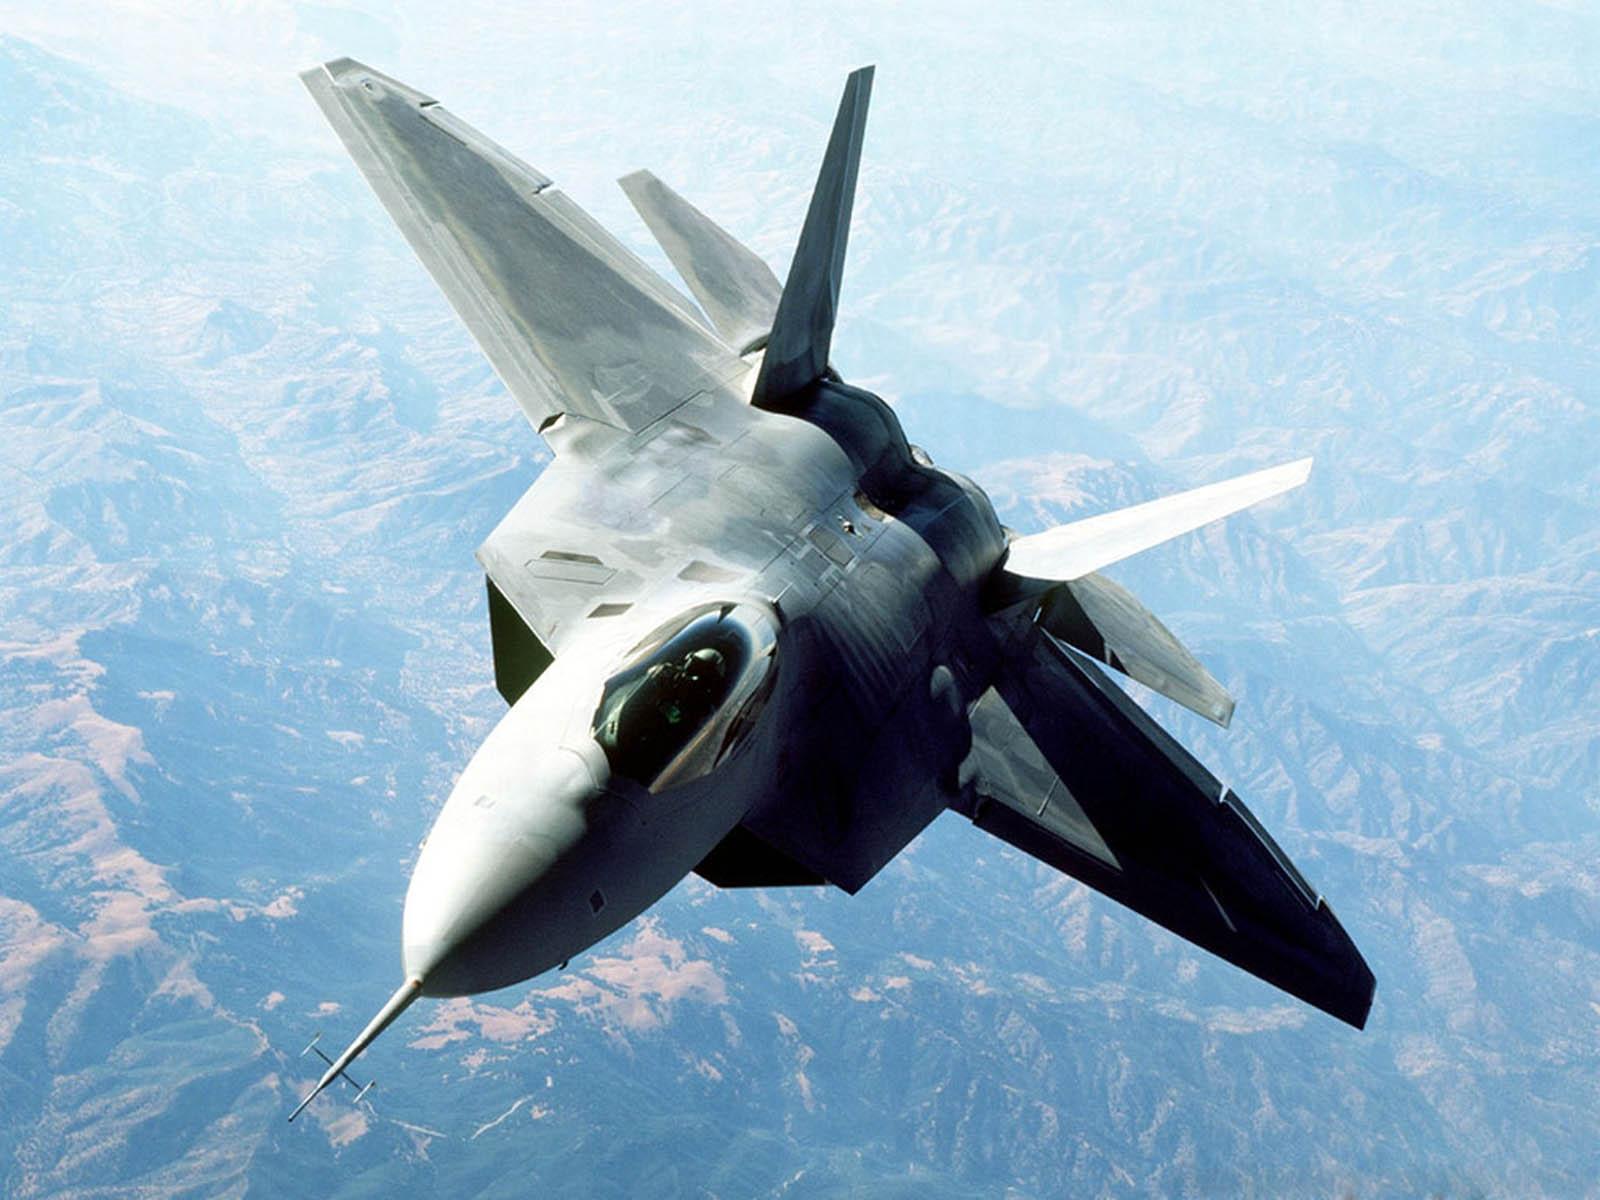 Wallpaper f 22 raptor military jet fighter wallpapers - Jet wallpaper ...